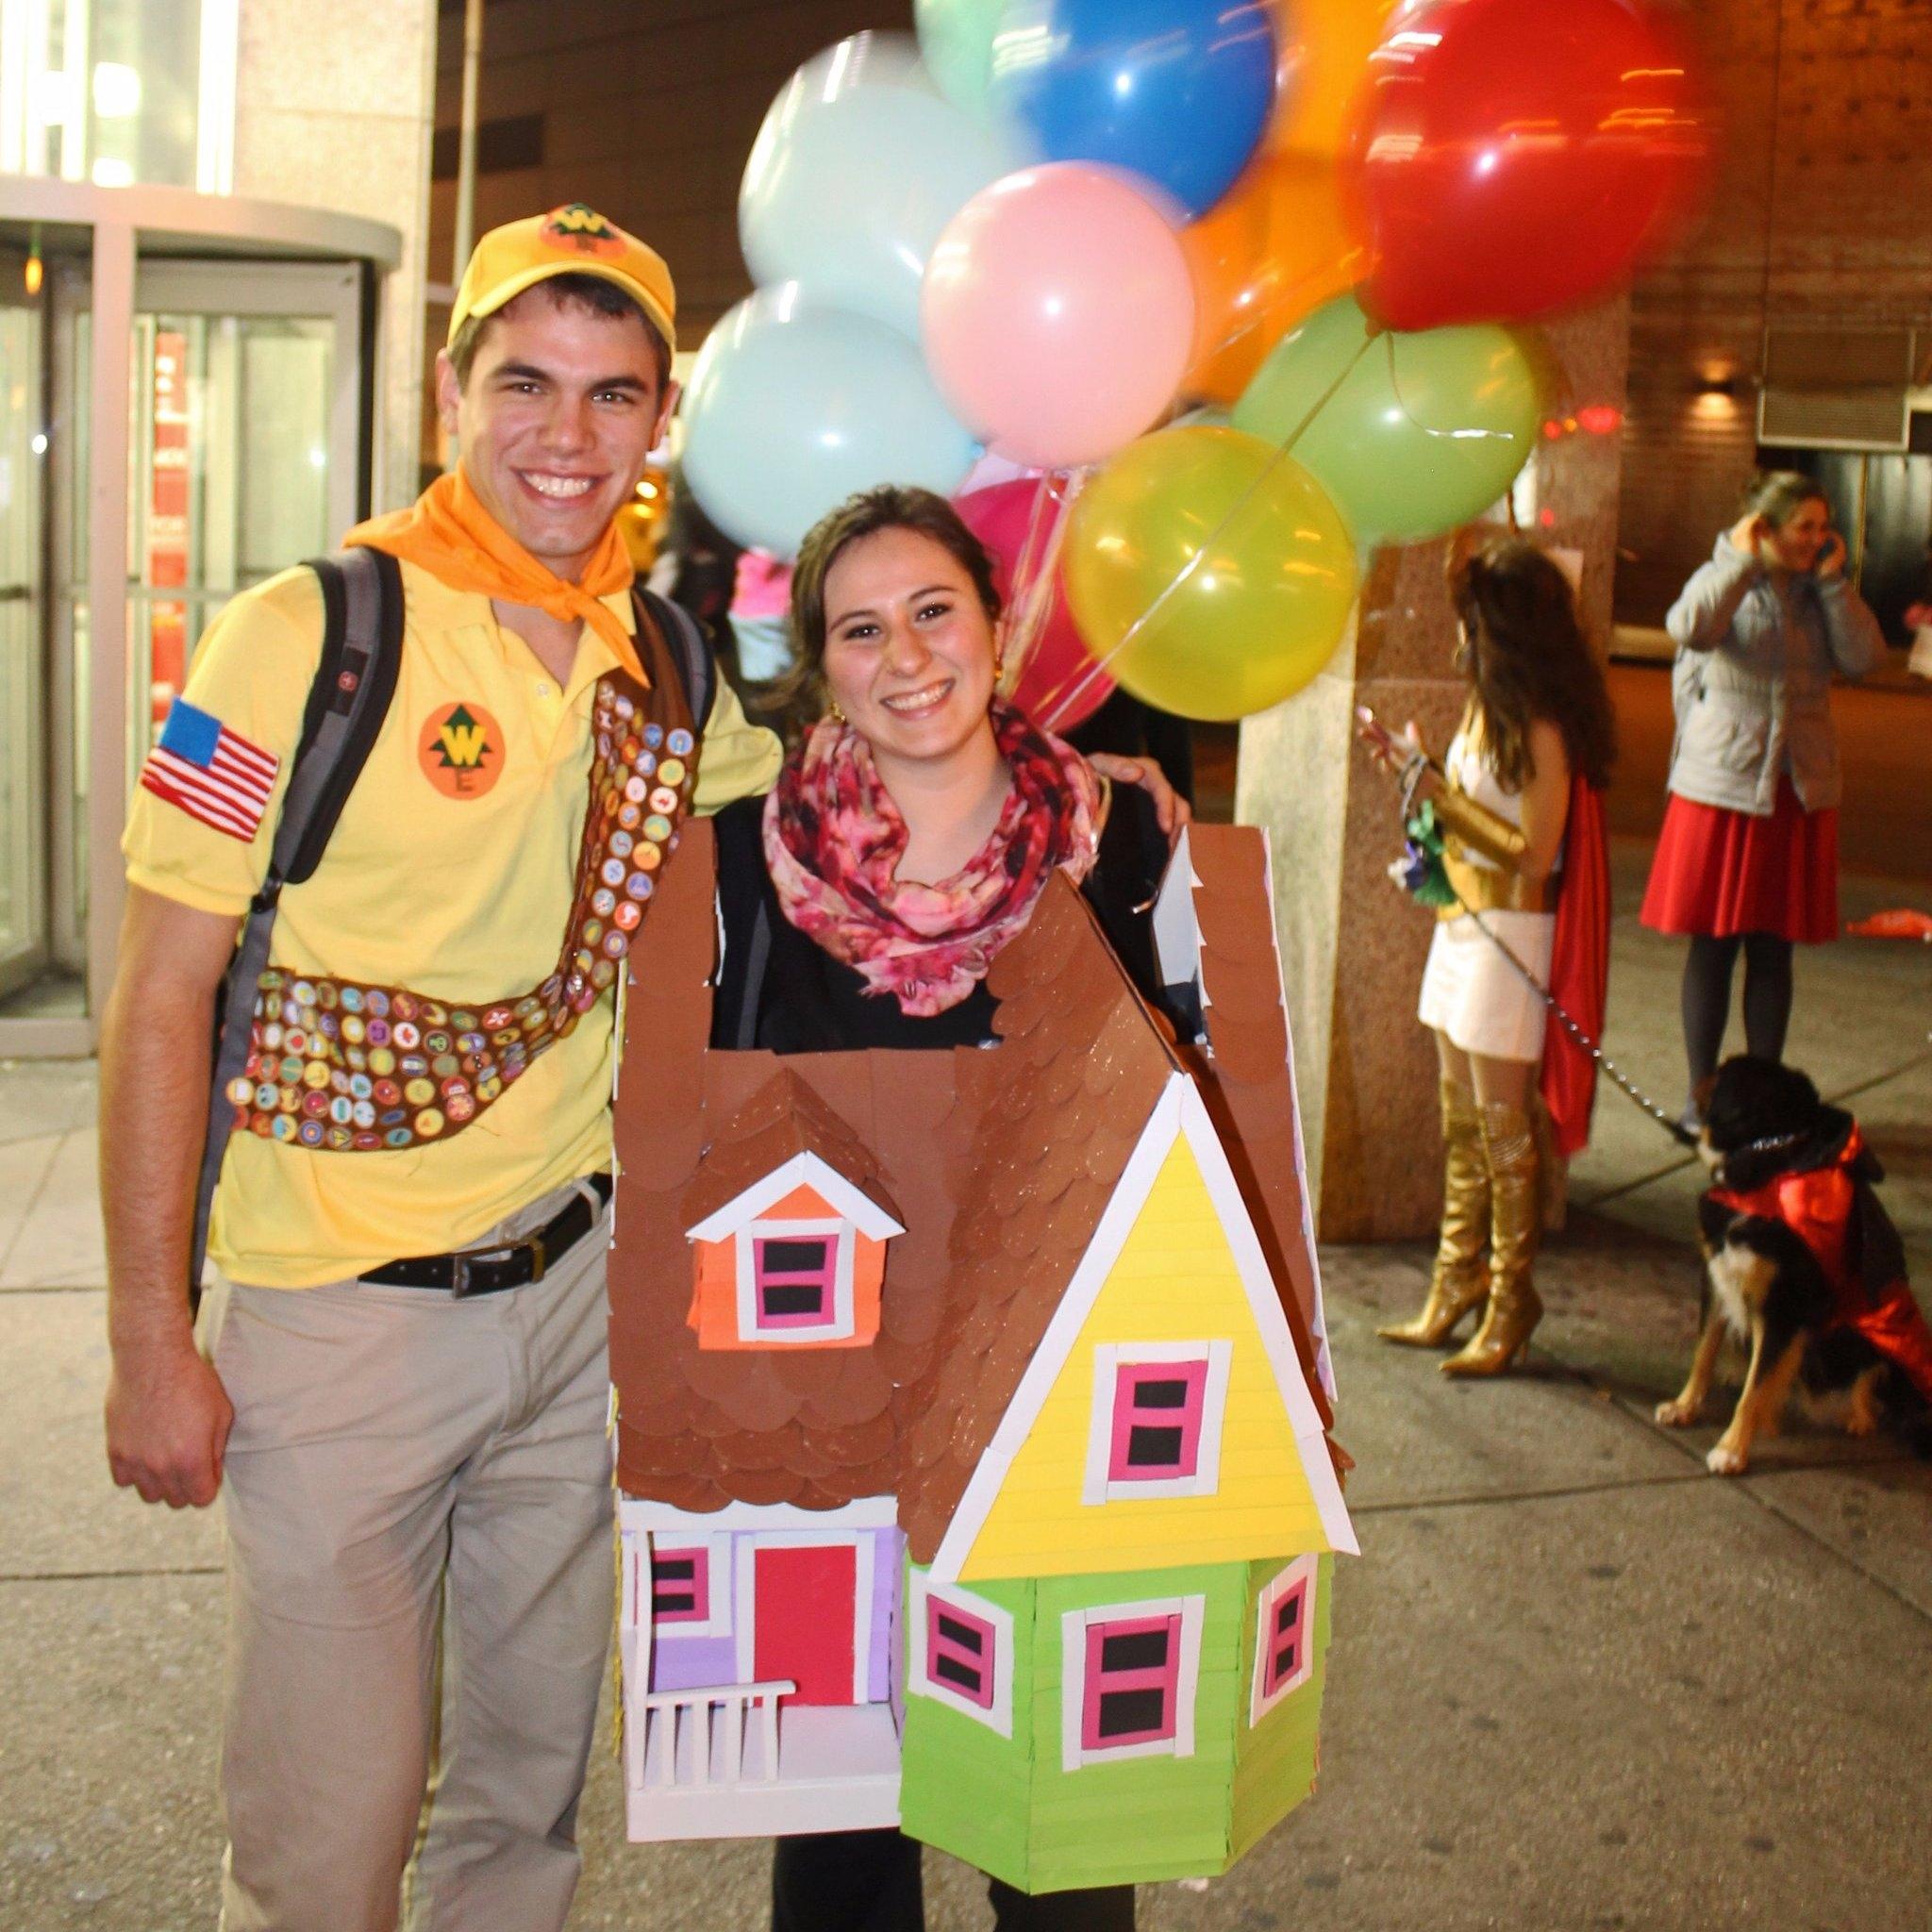 10 Wonderful Funny Couple Halloween Costumes Ideas cheap diy couples halloween costumes popsugar smart living 24 2020